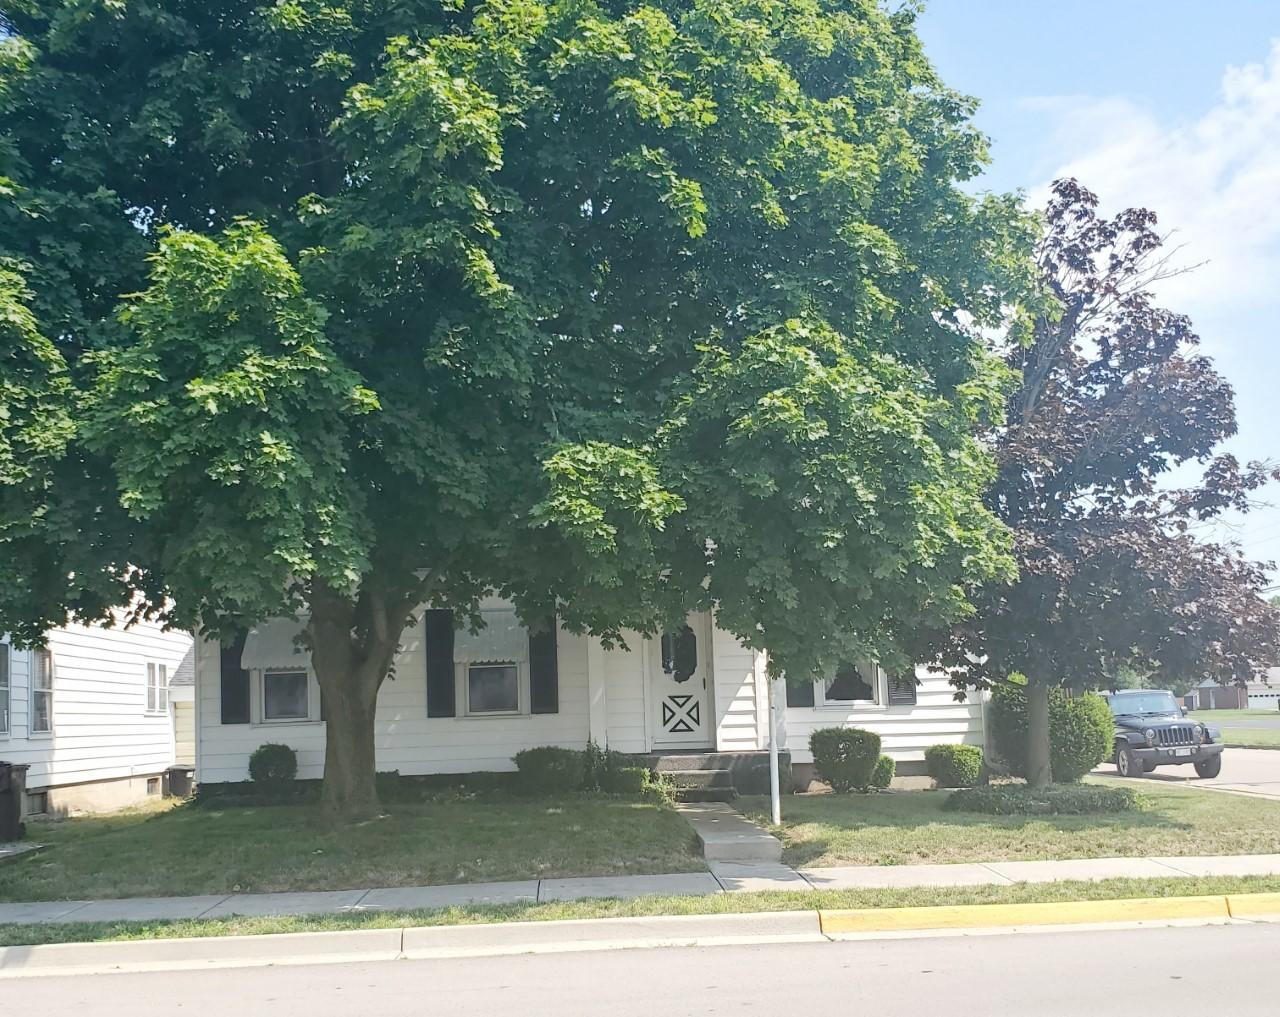 218 E Monument St Pleasant Hill, OH